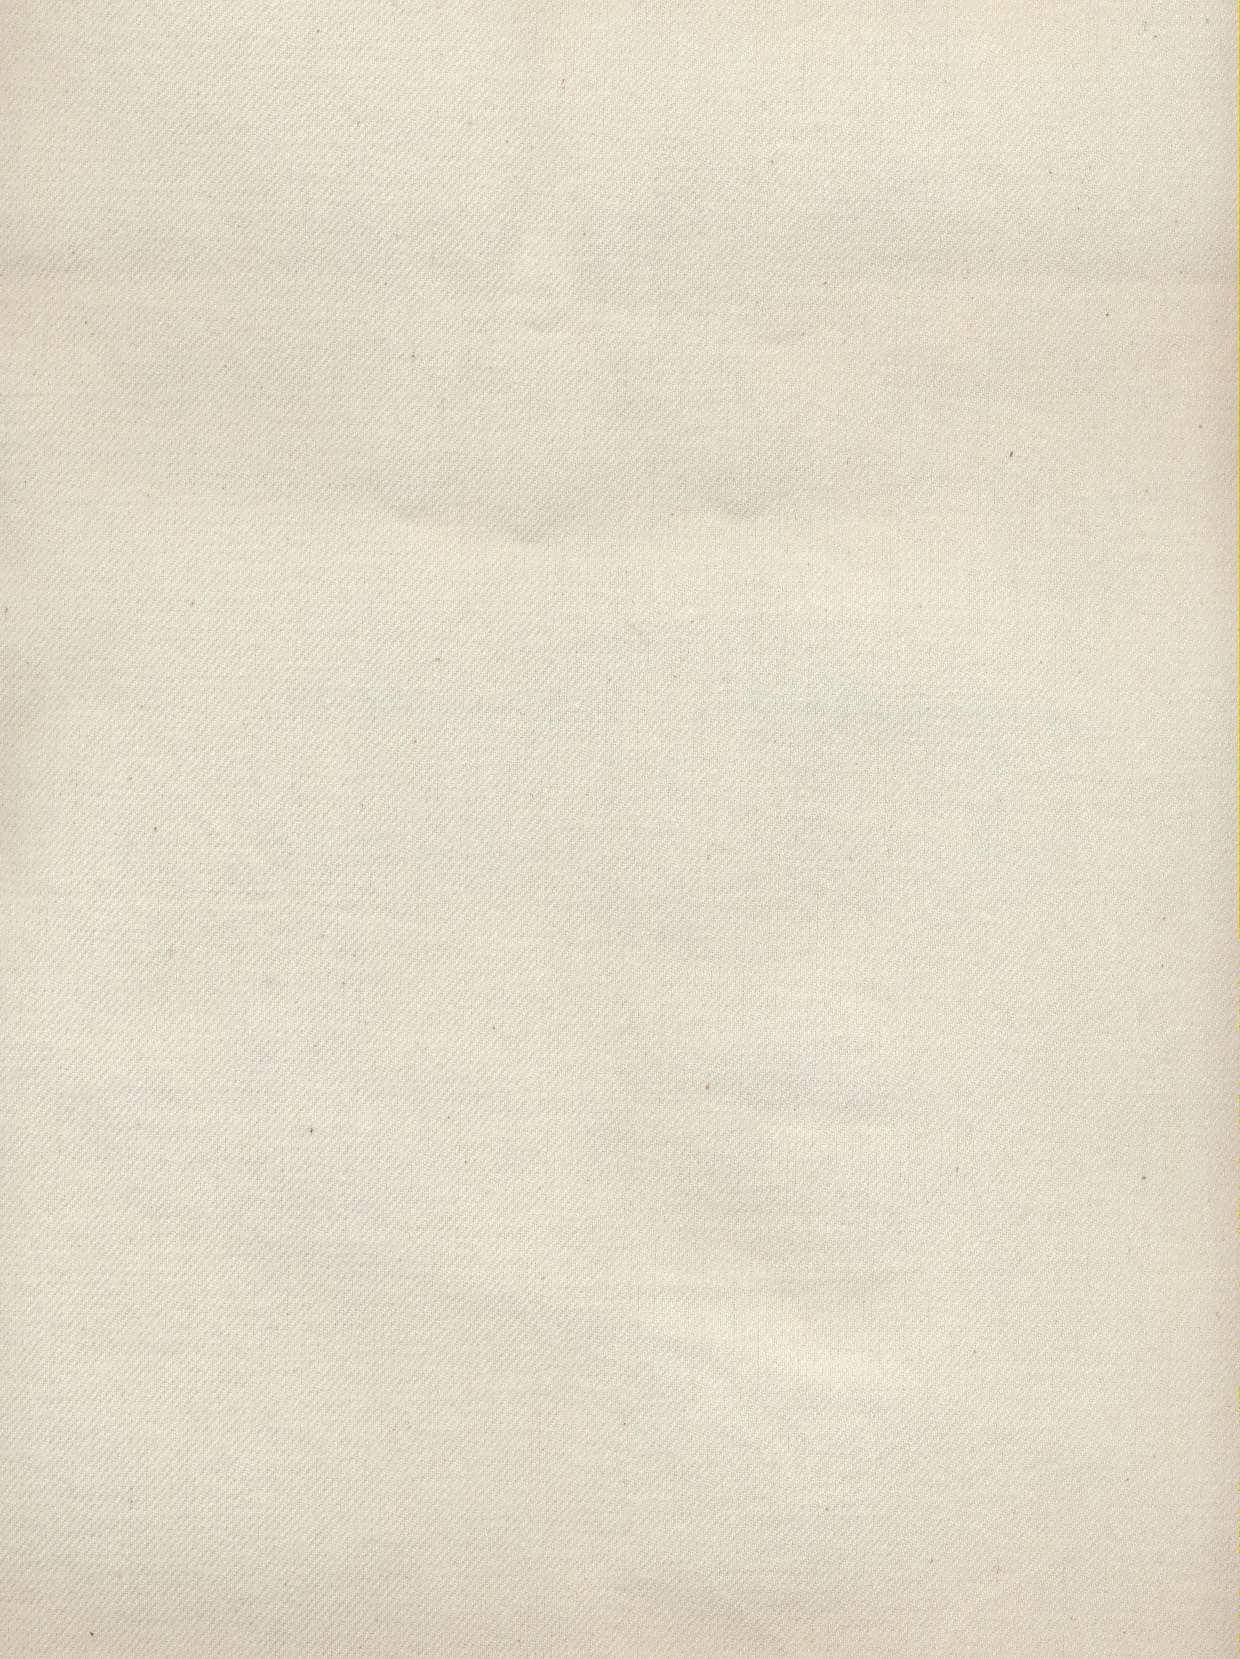 کیف پارچه ای 40*40 پنبه (طرح پنج ترنج)